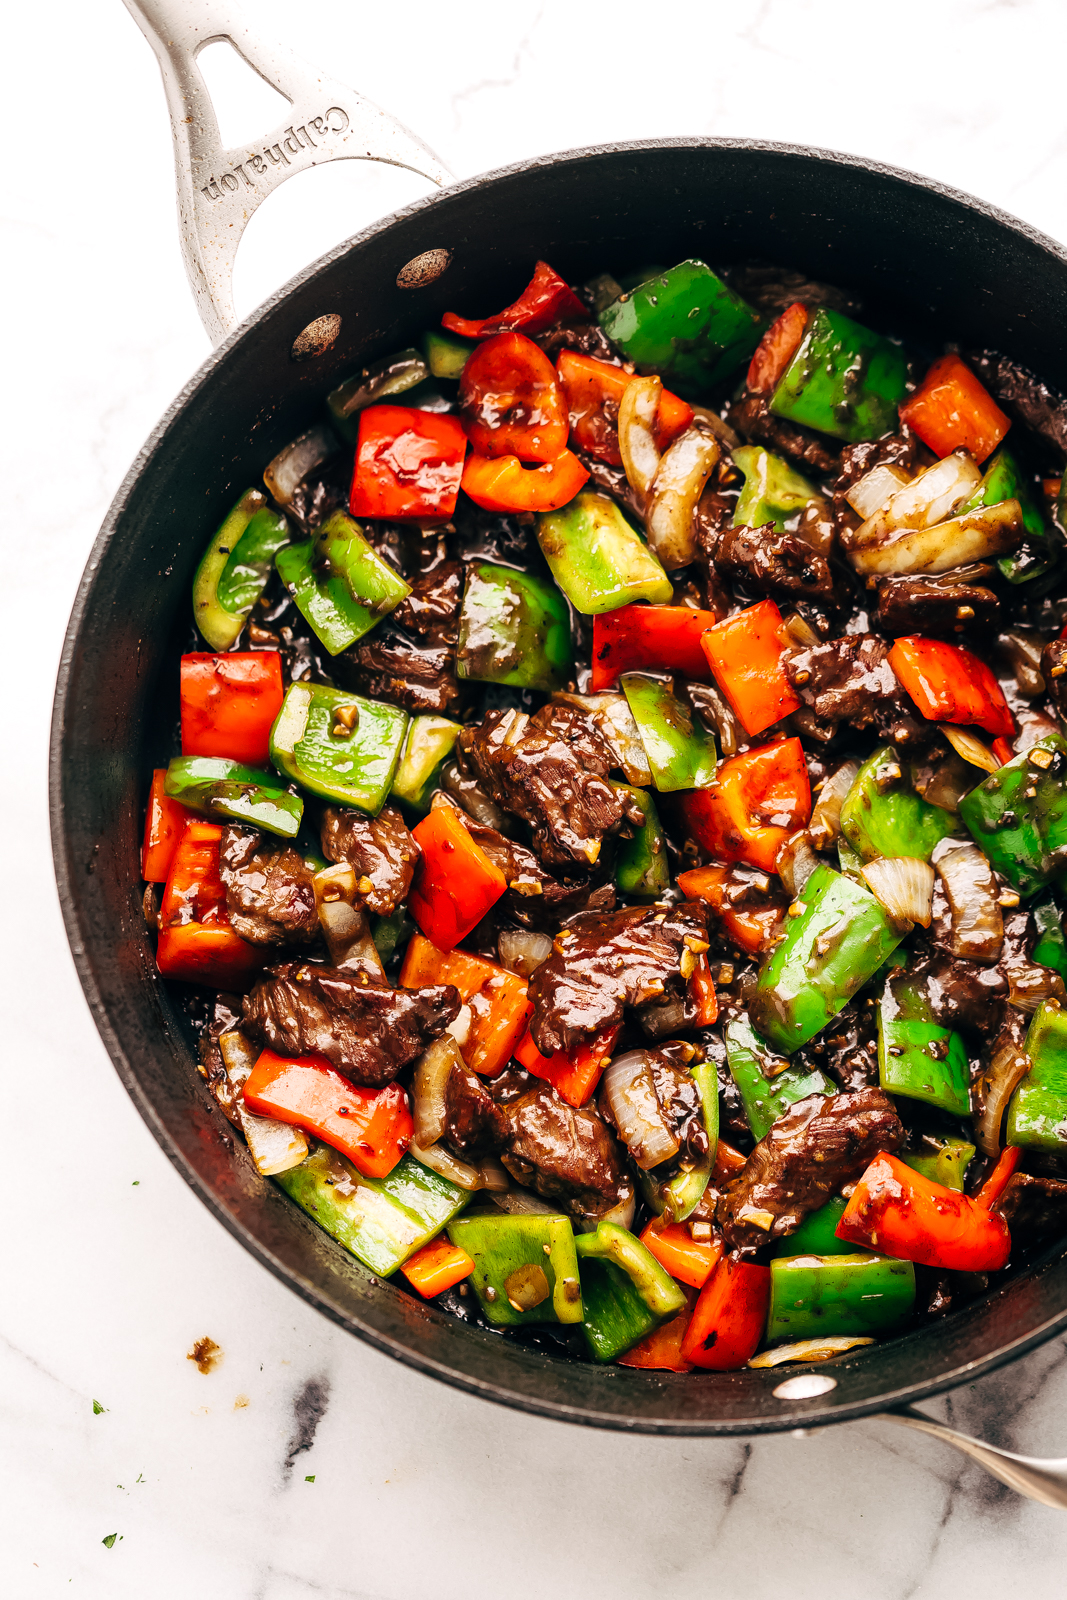 Garlic Lovers Pepper Steak Stir Fry Recipe | Little Spice Jar